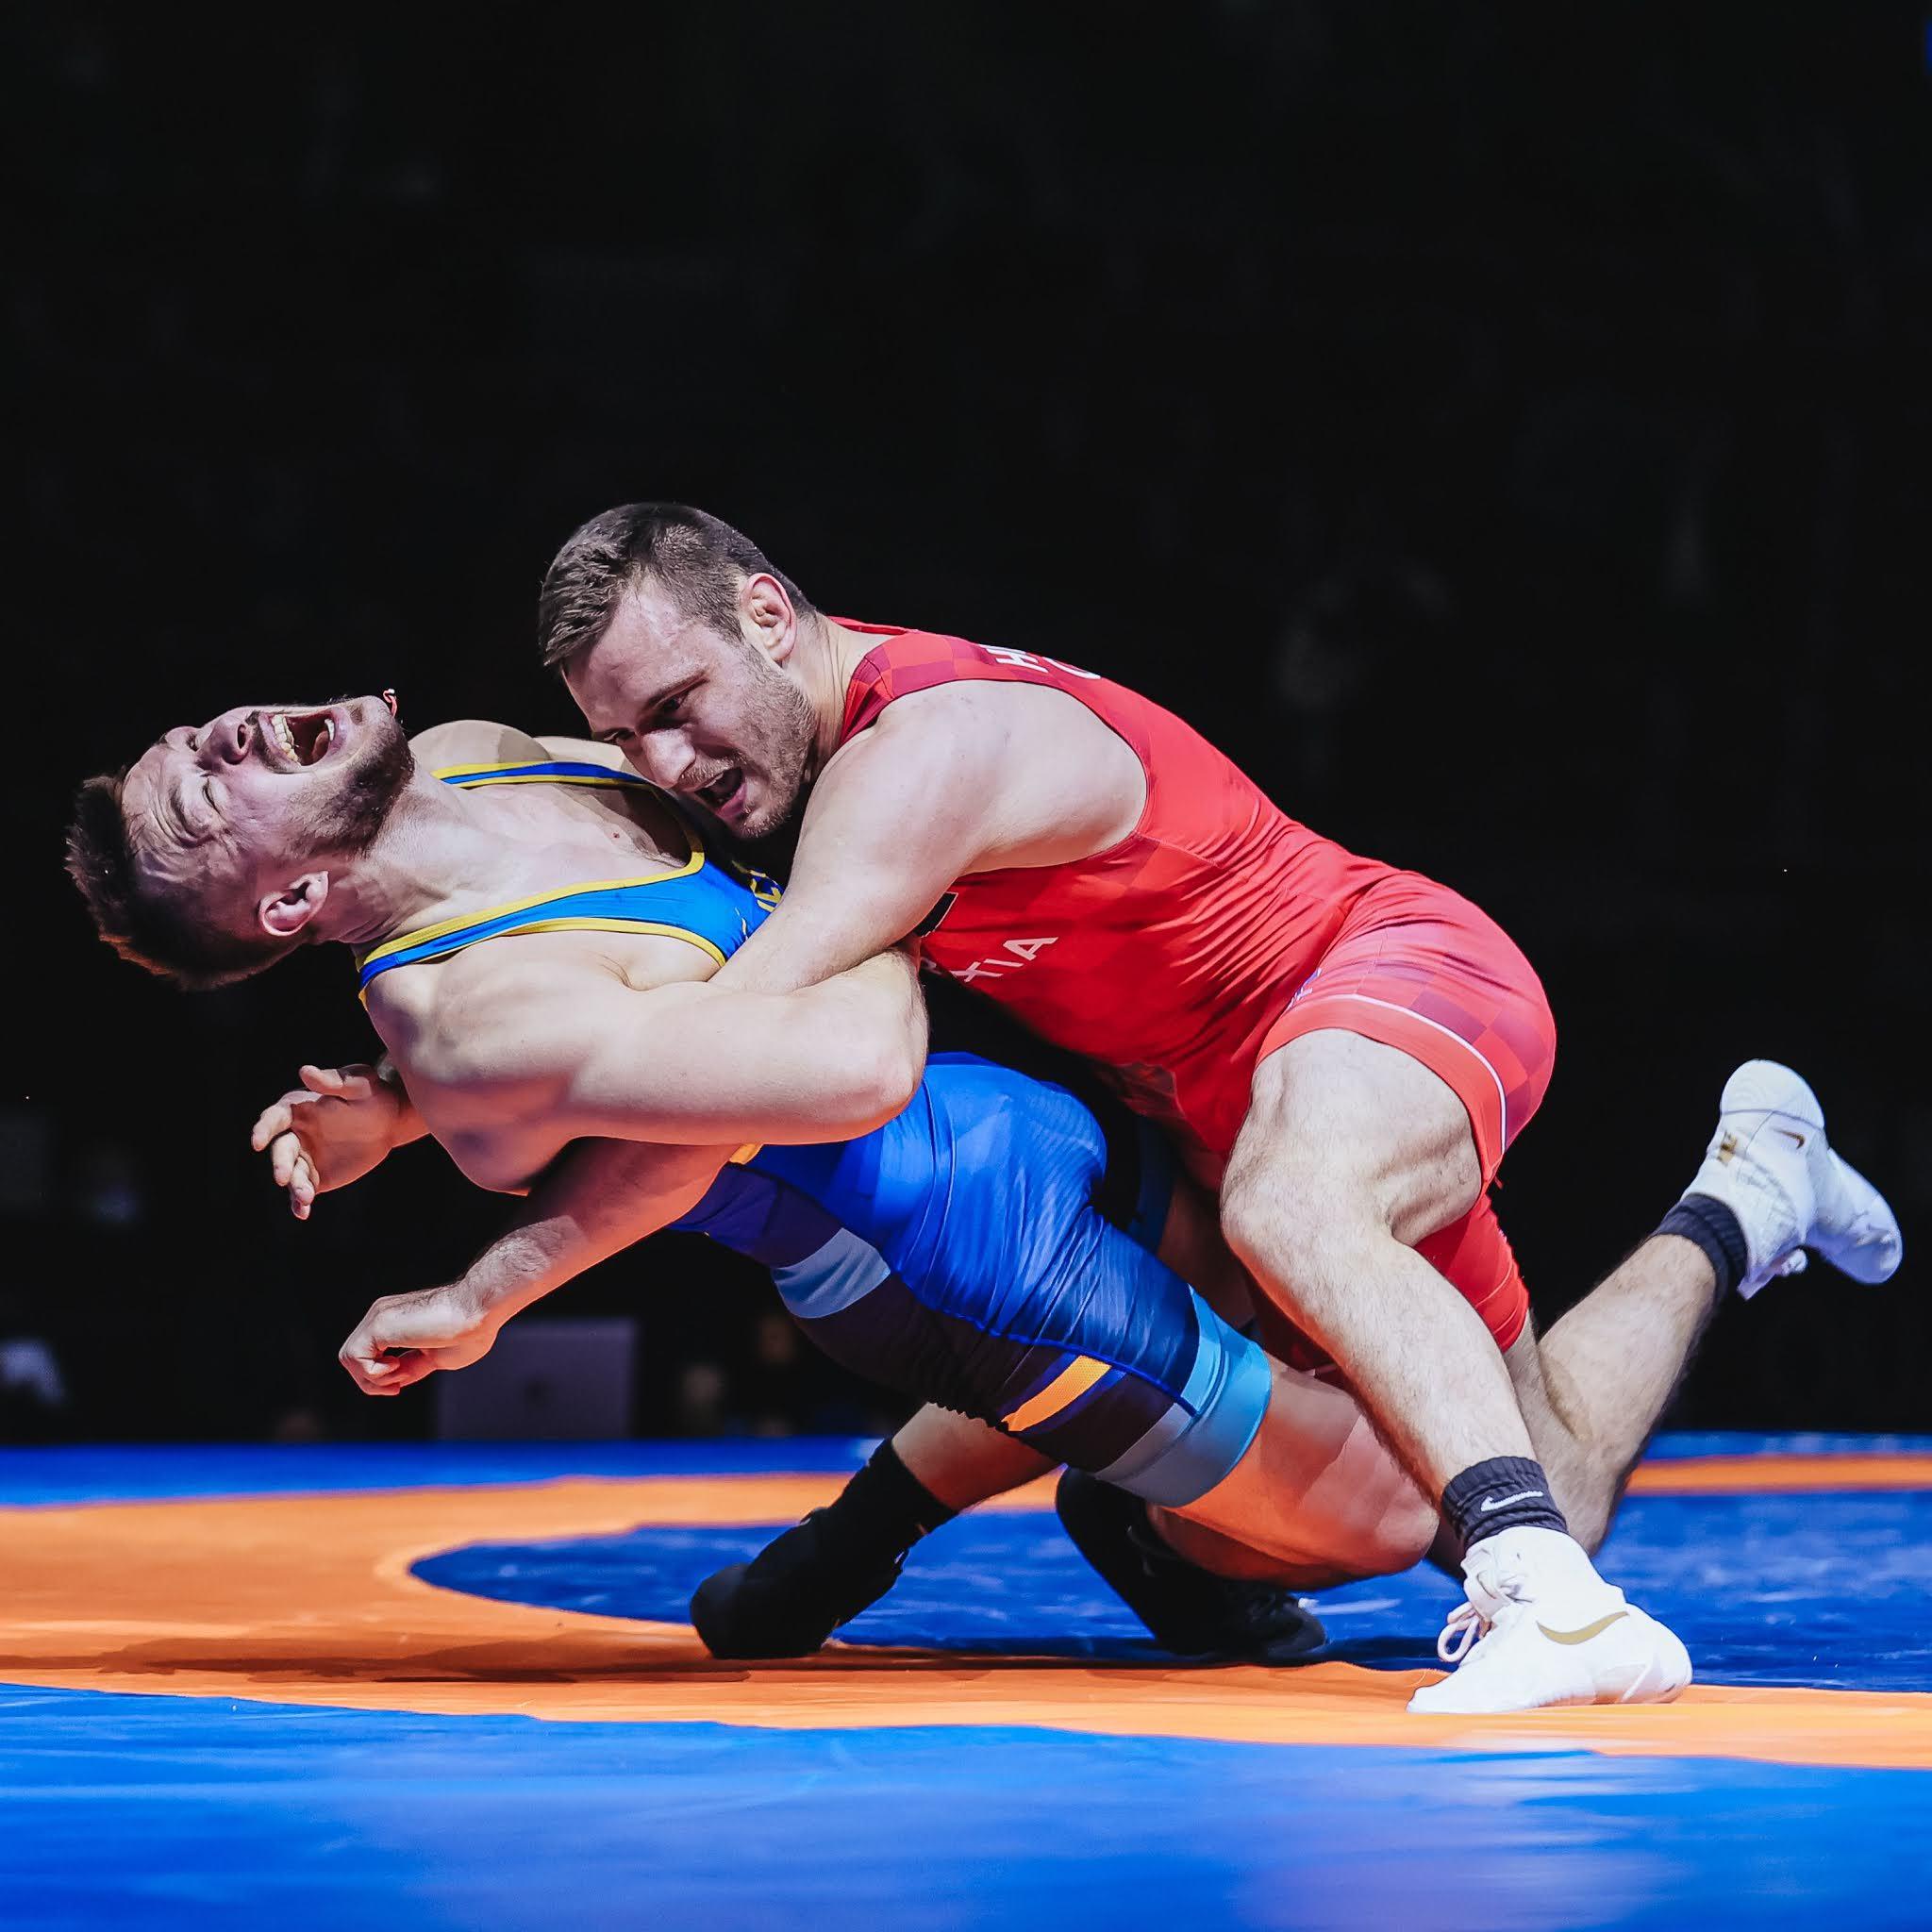 Ivan Huklek  Zakarias Berg Croácia Croatia top Sweden Suécia Tóquio 2020 Pré-olímpico